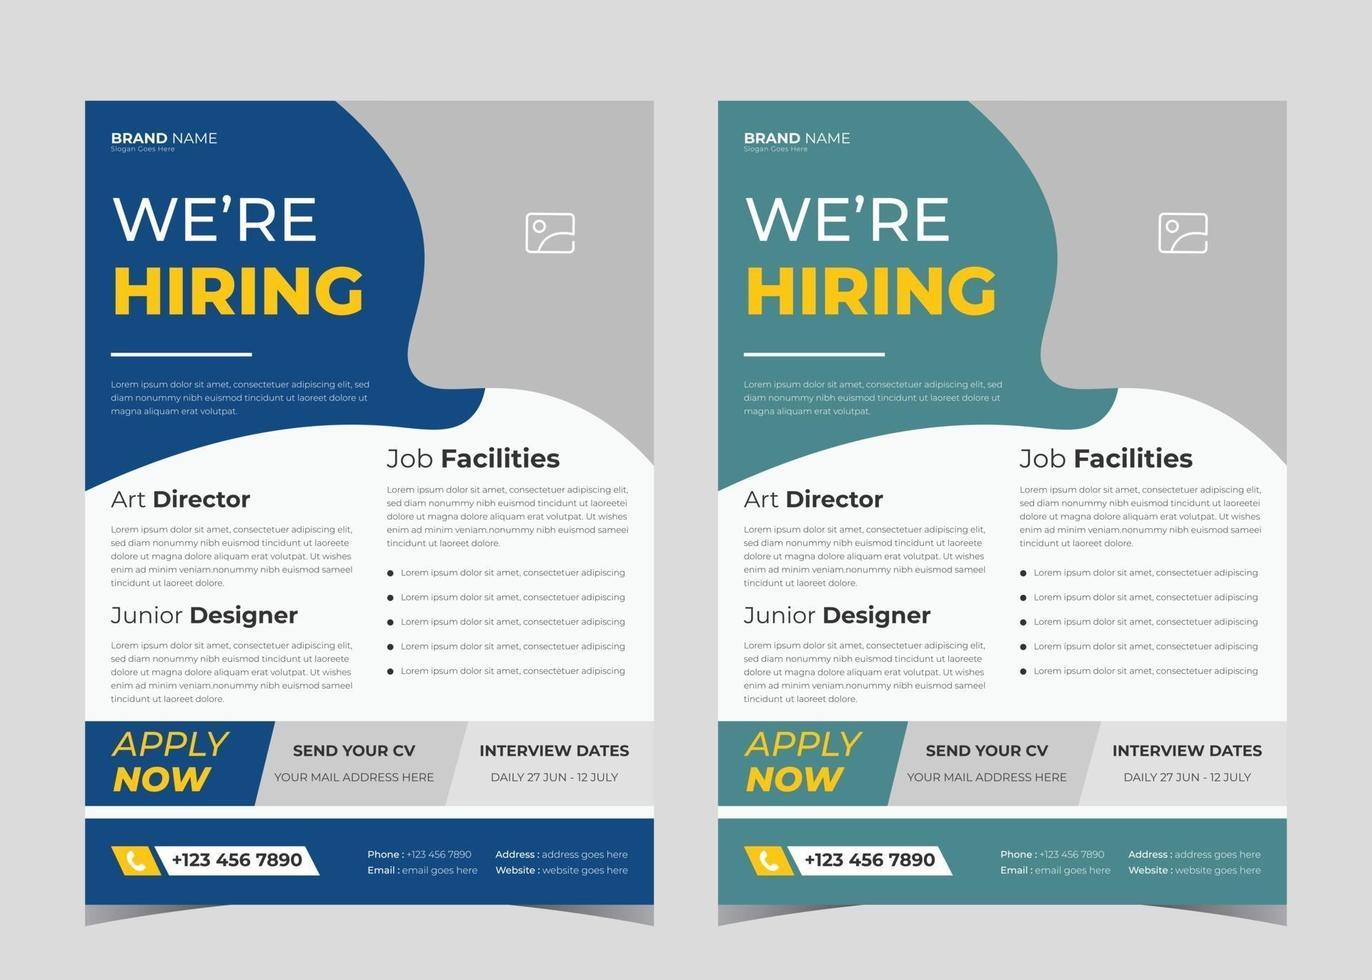 Download your design in jpg, png, or pdf. We Are Hiring Flyer Design We Are Hiring Poster Template Job Vacancy Leaflet Flyer Template Design 2629088 Vector Art At Vecteezy